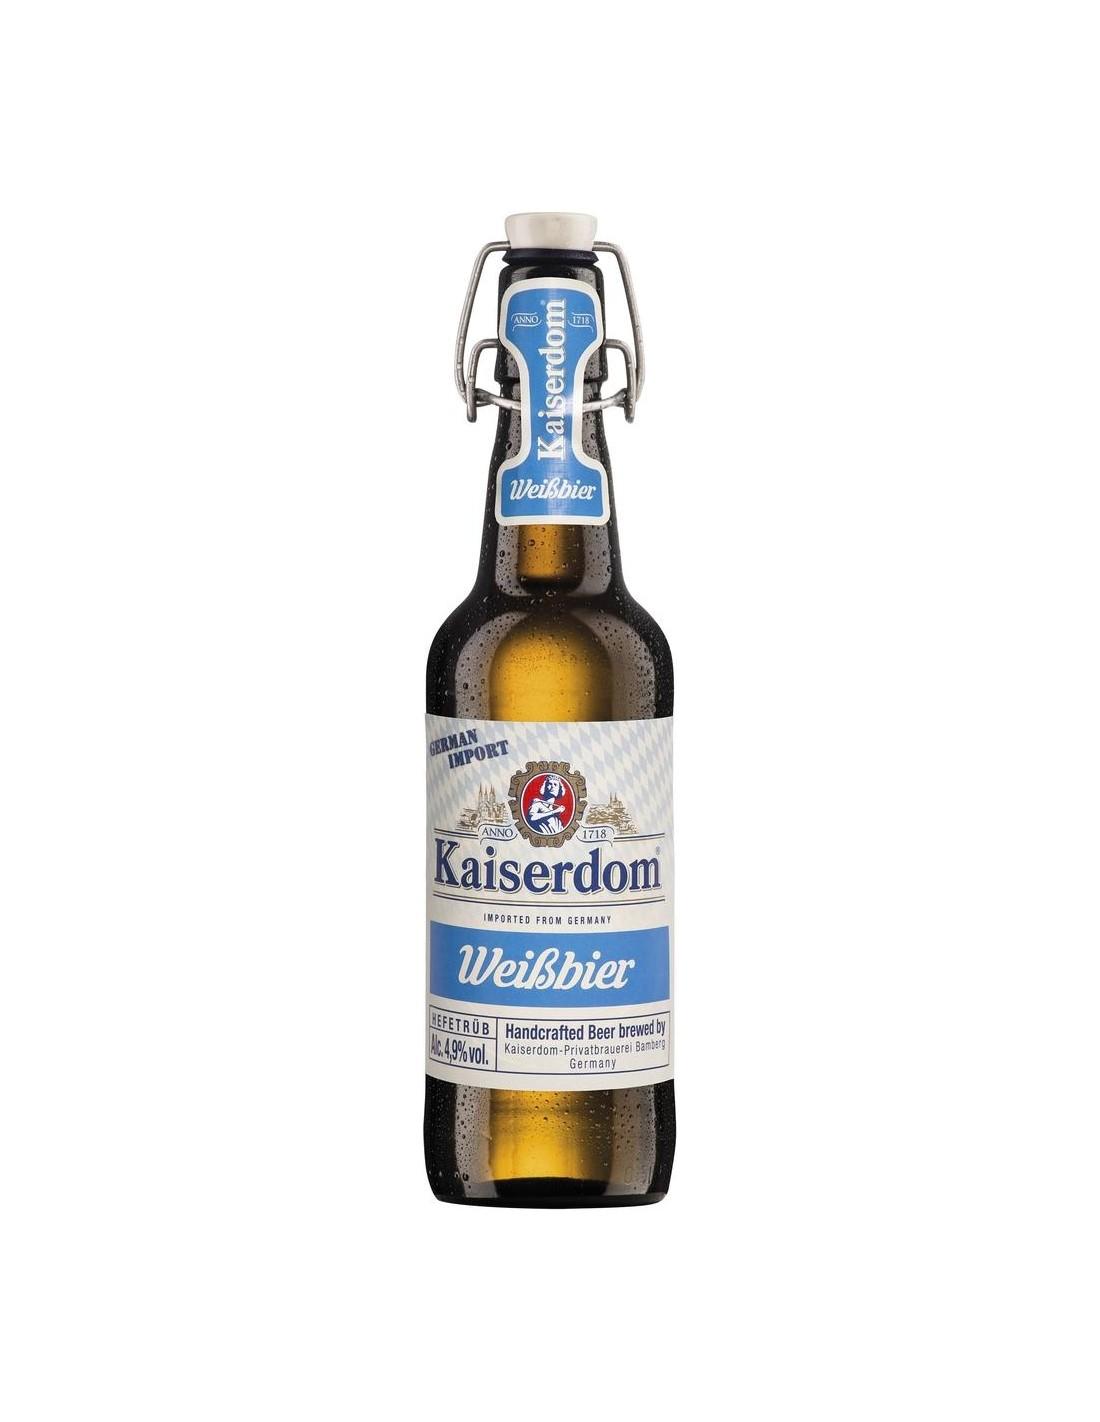 Bere blonda, Kaiserdom, 4.9% alc., 0.5L, Germania